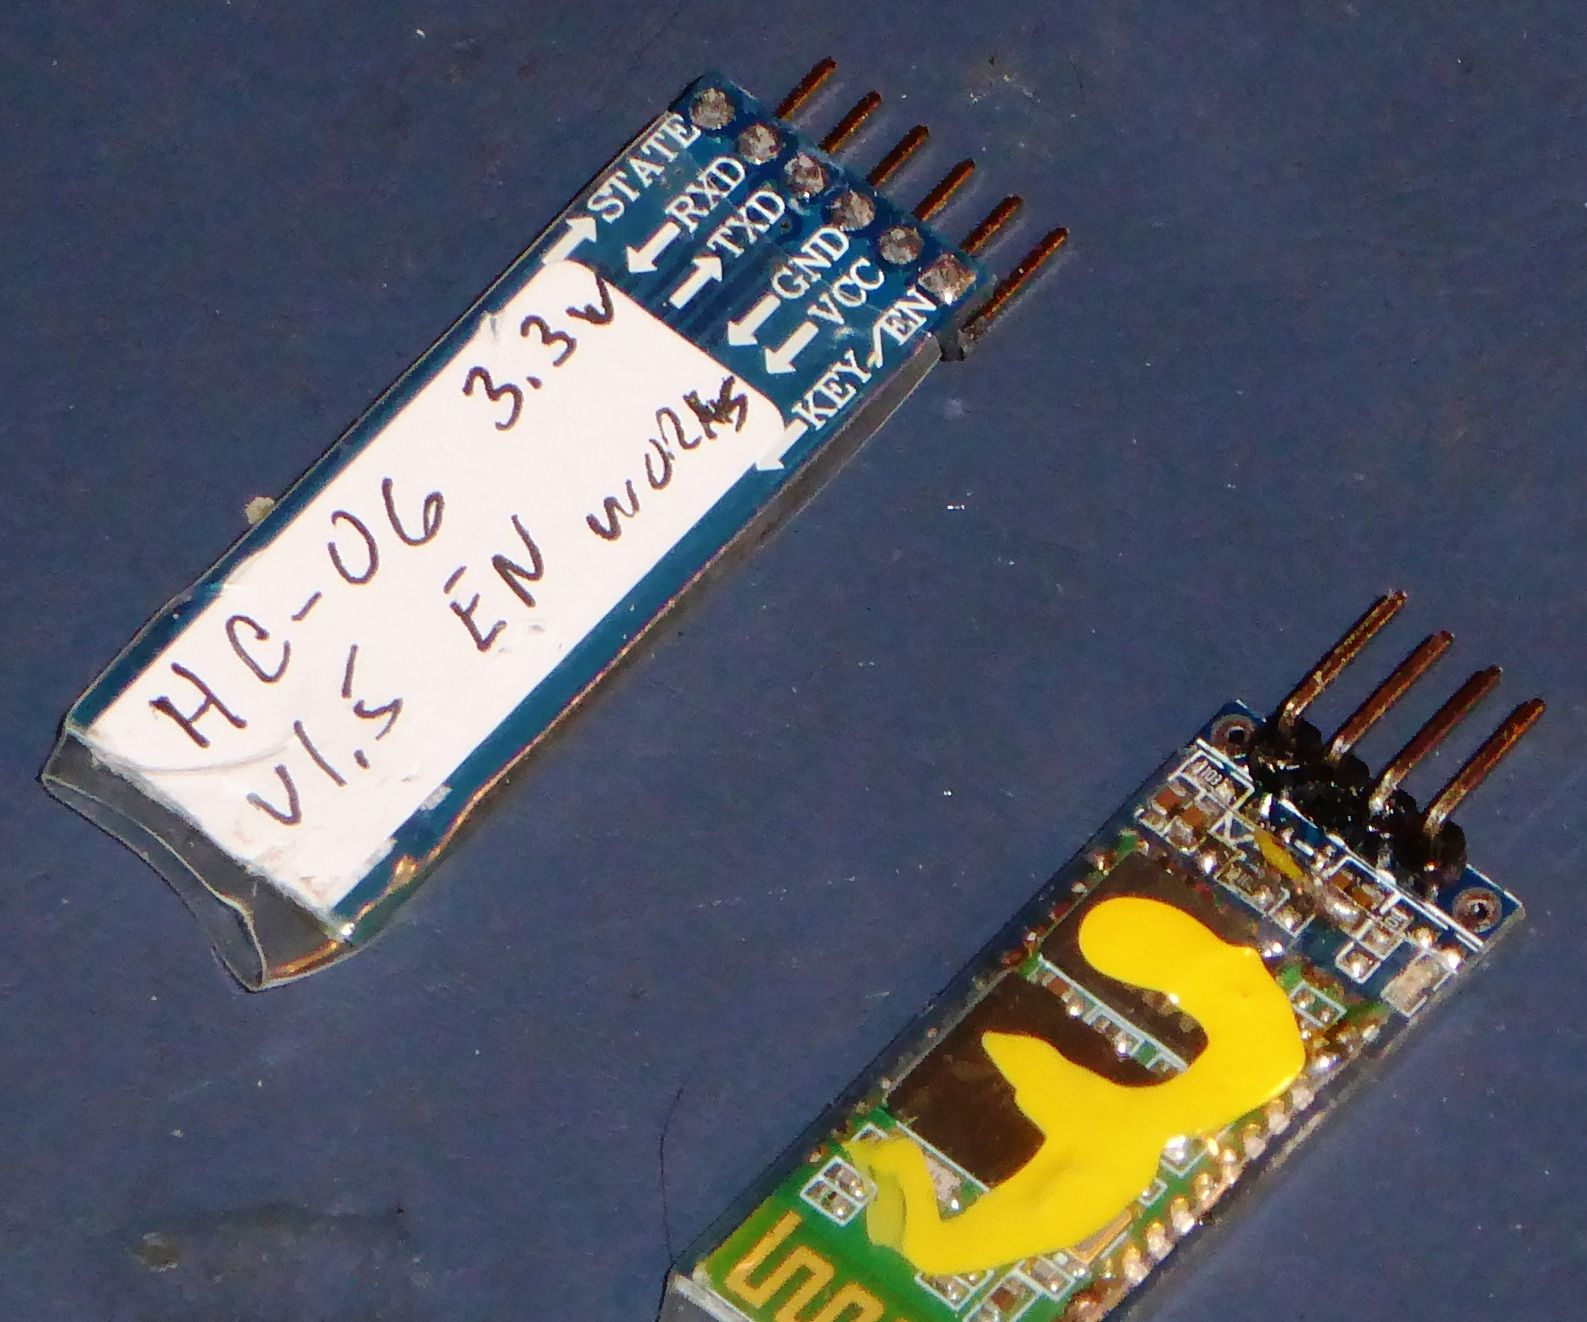 OldMan and Bluetooth